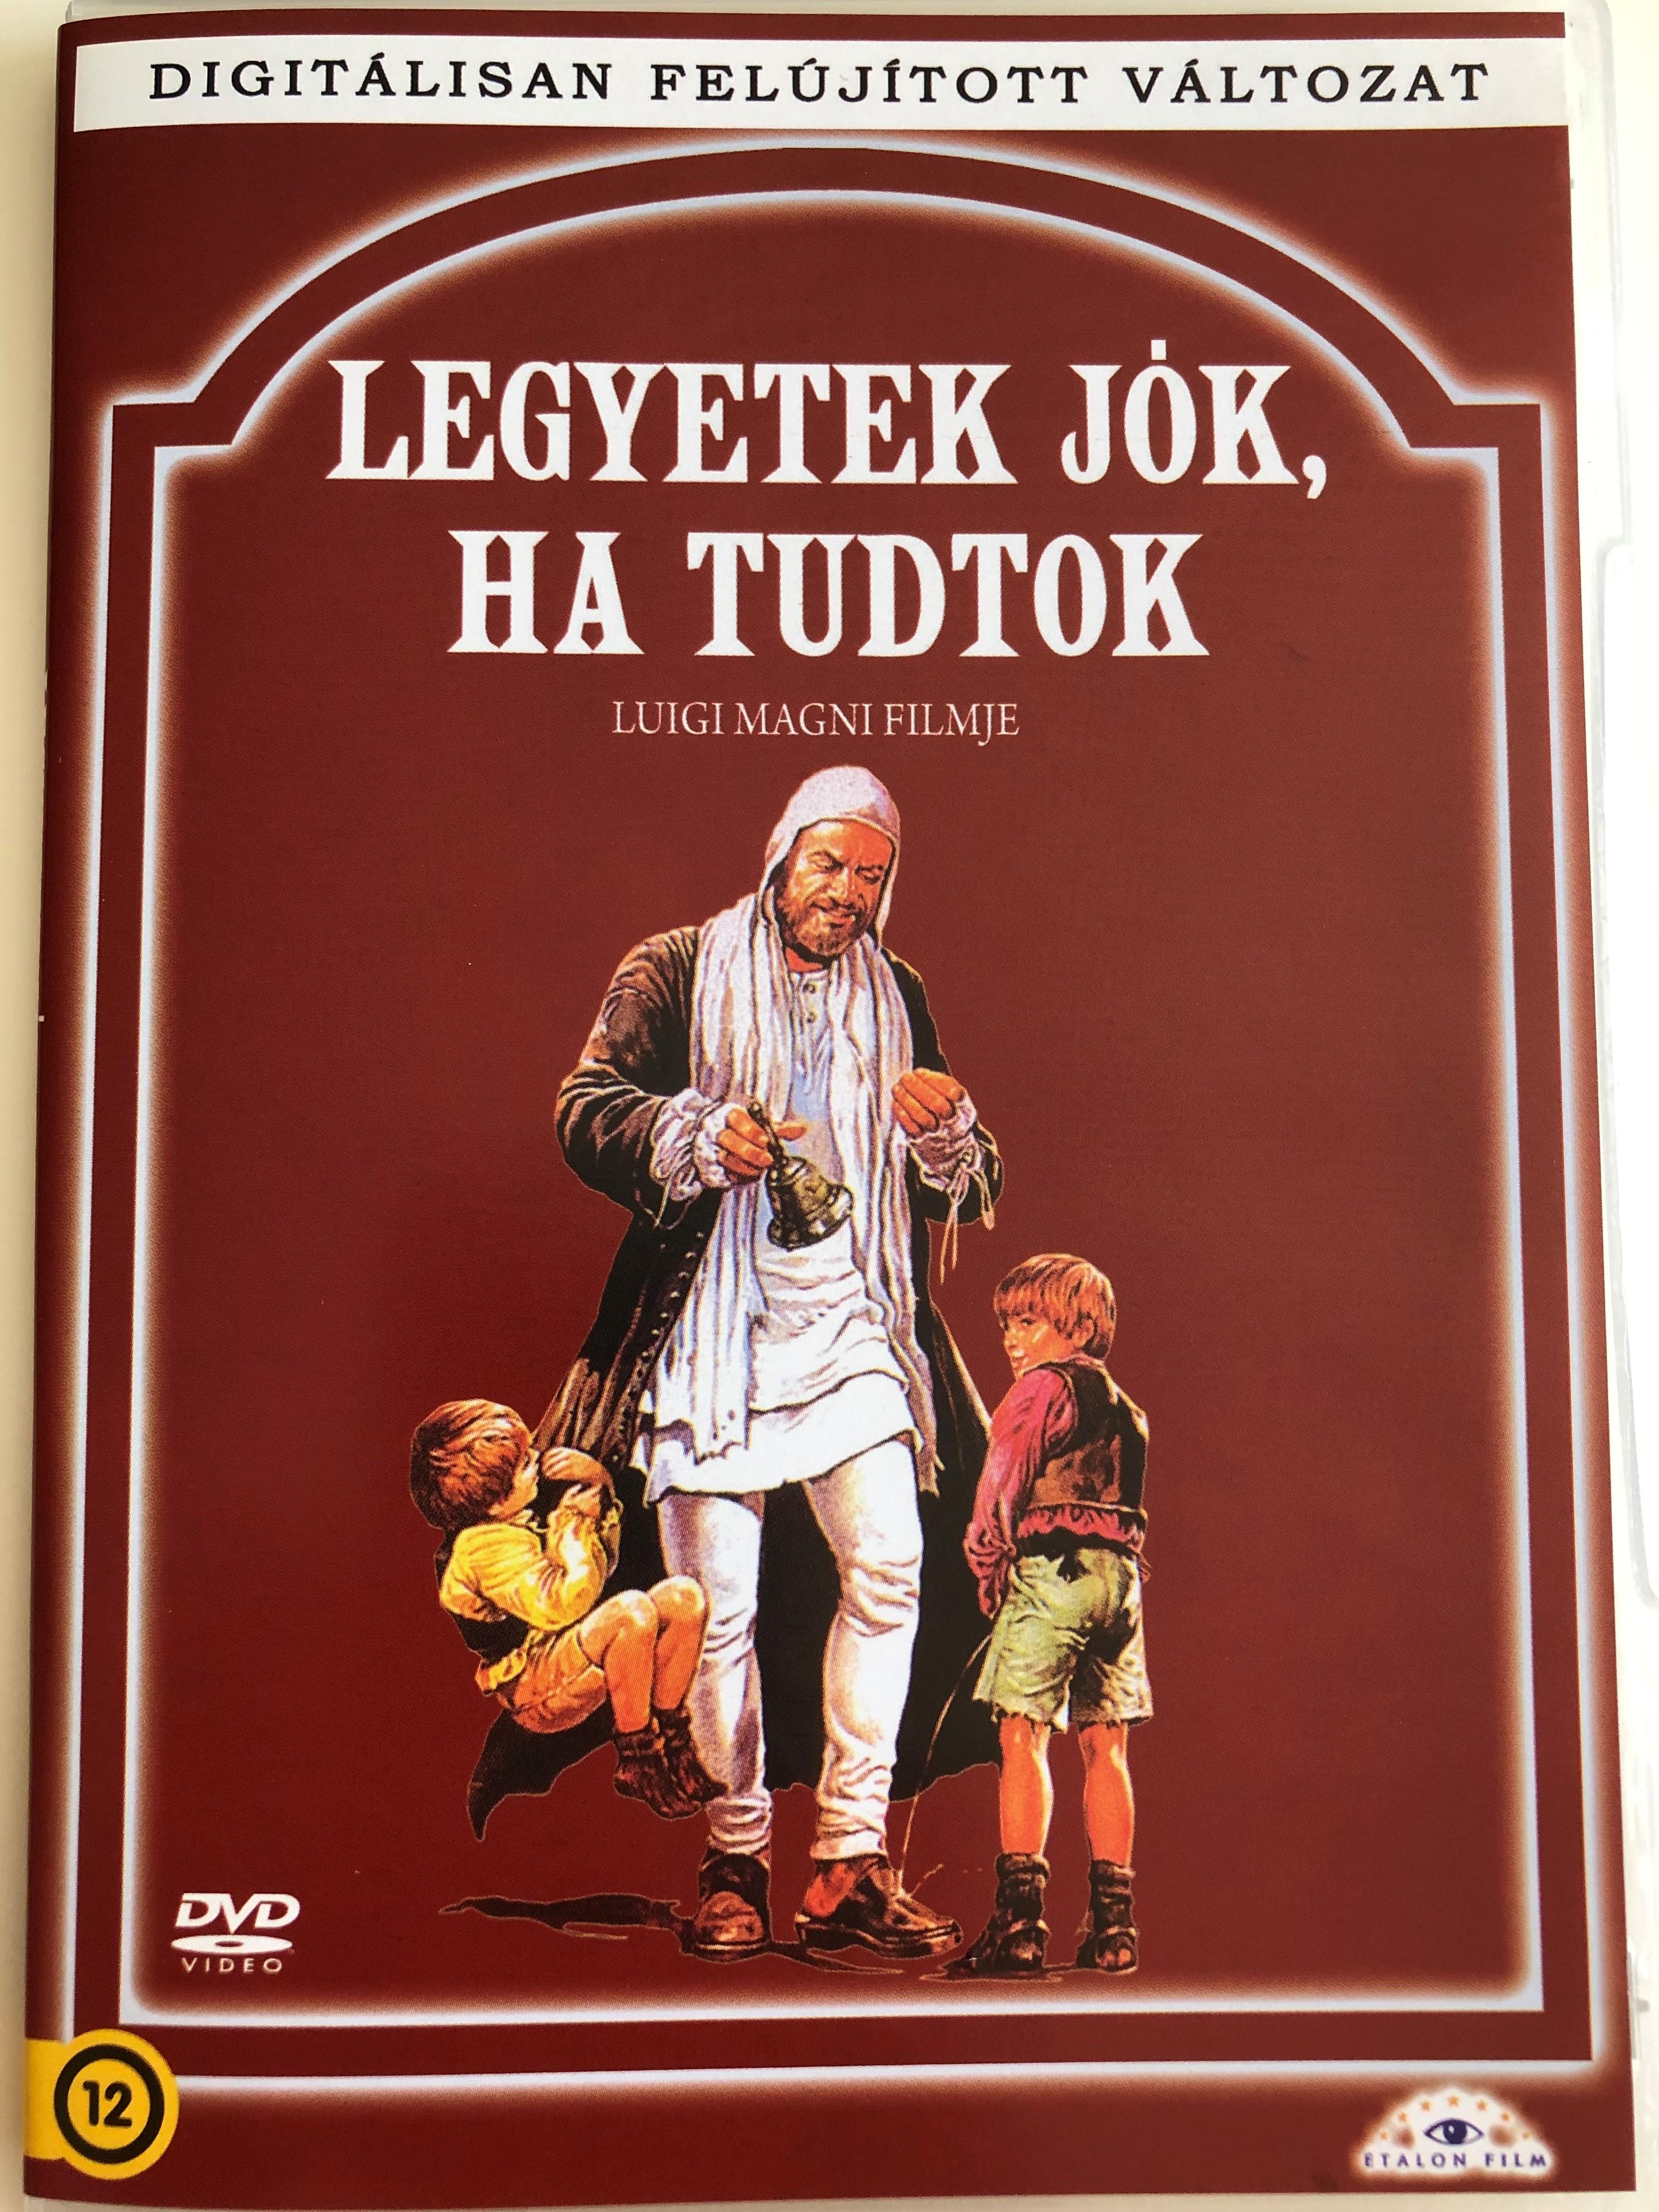 legyetek-j-k-ha-tudtok-dvd-1983-state-buoni-se-potete-directed-by-luigi-magni-starring-johnny-dorelli-mario-adorf-philippe-leroy-renzo-montagnani-1-.jpg